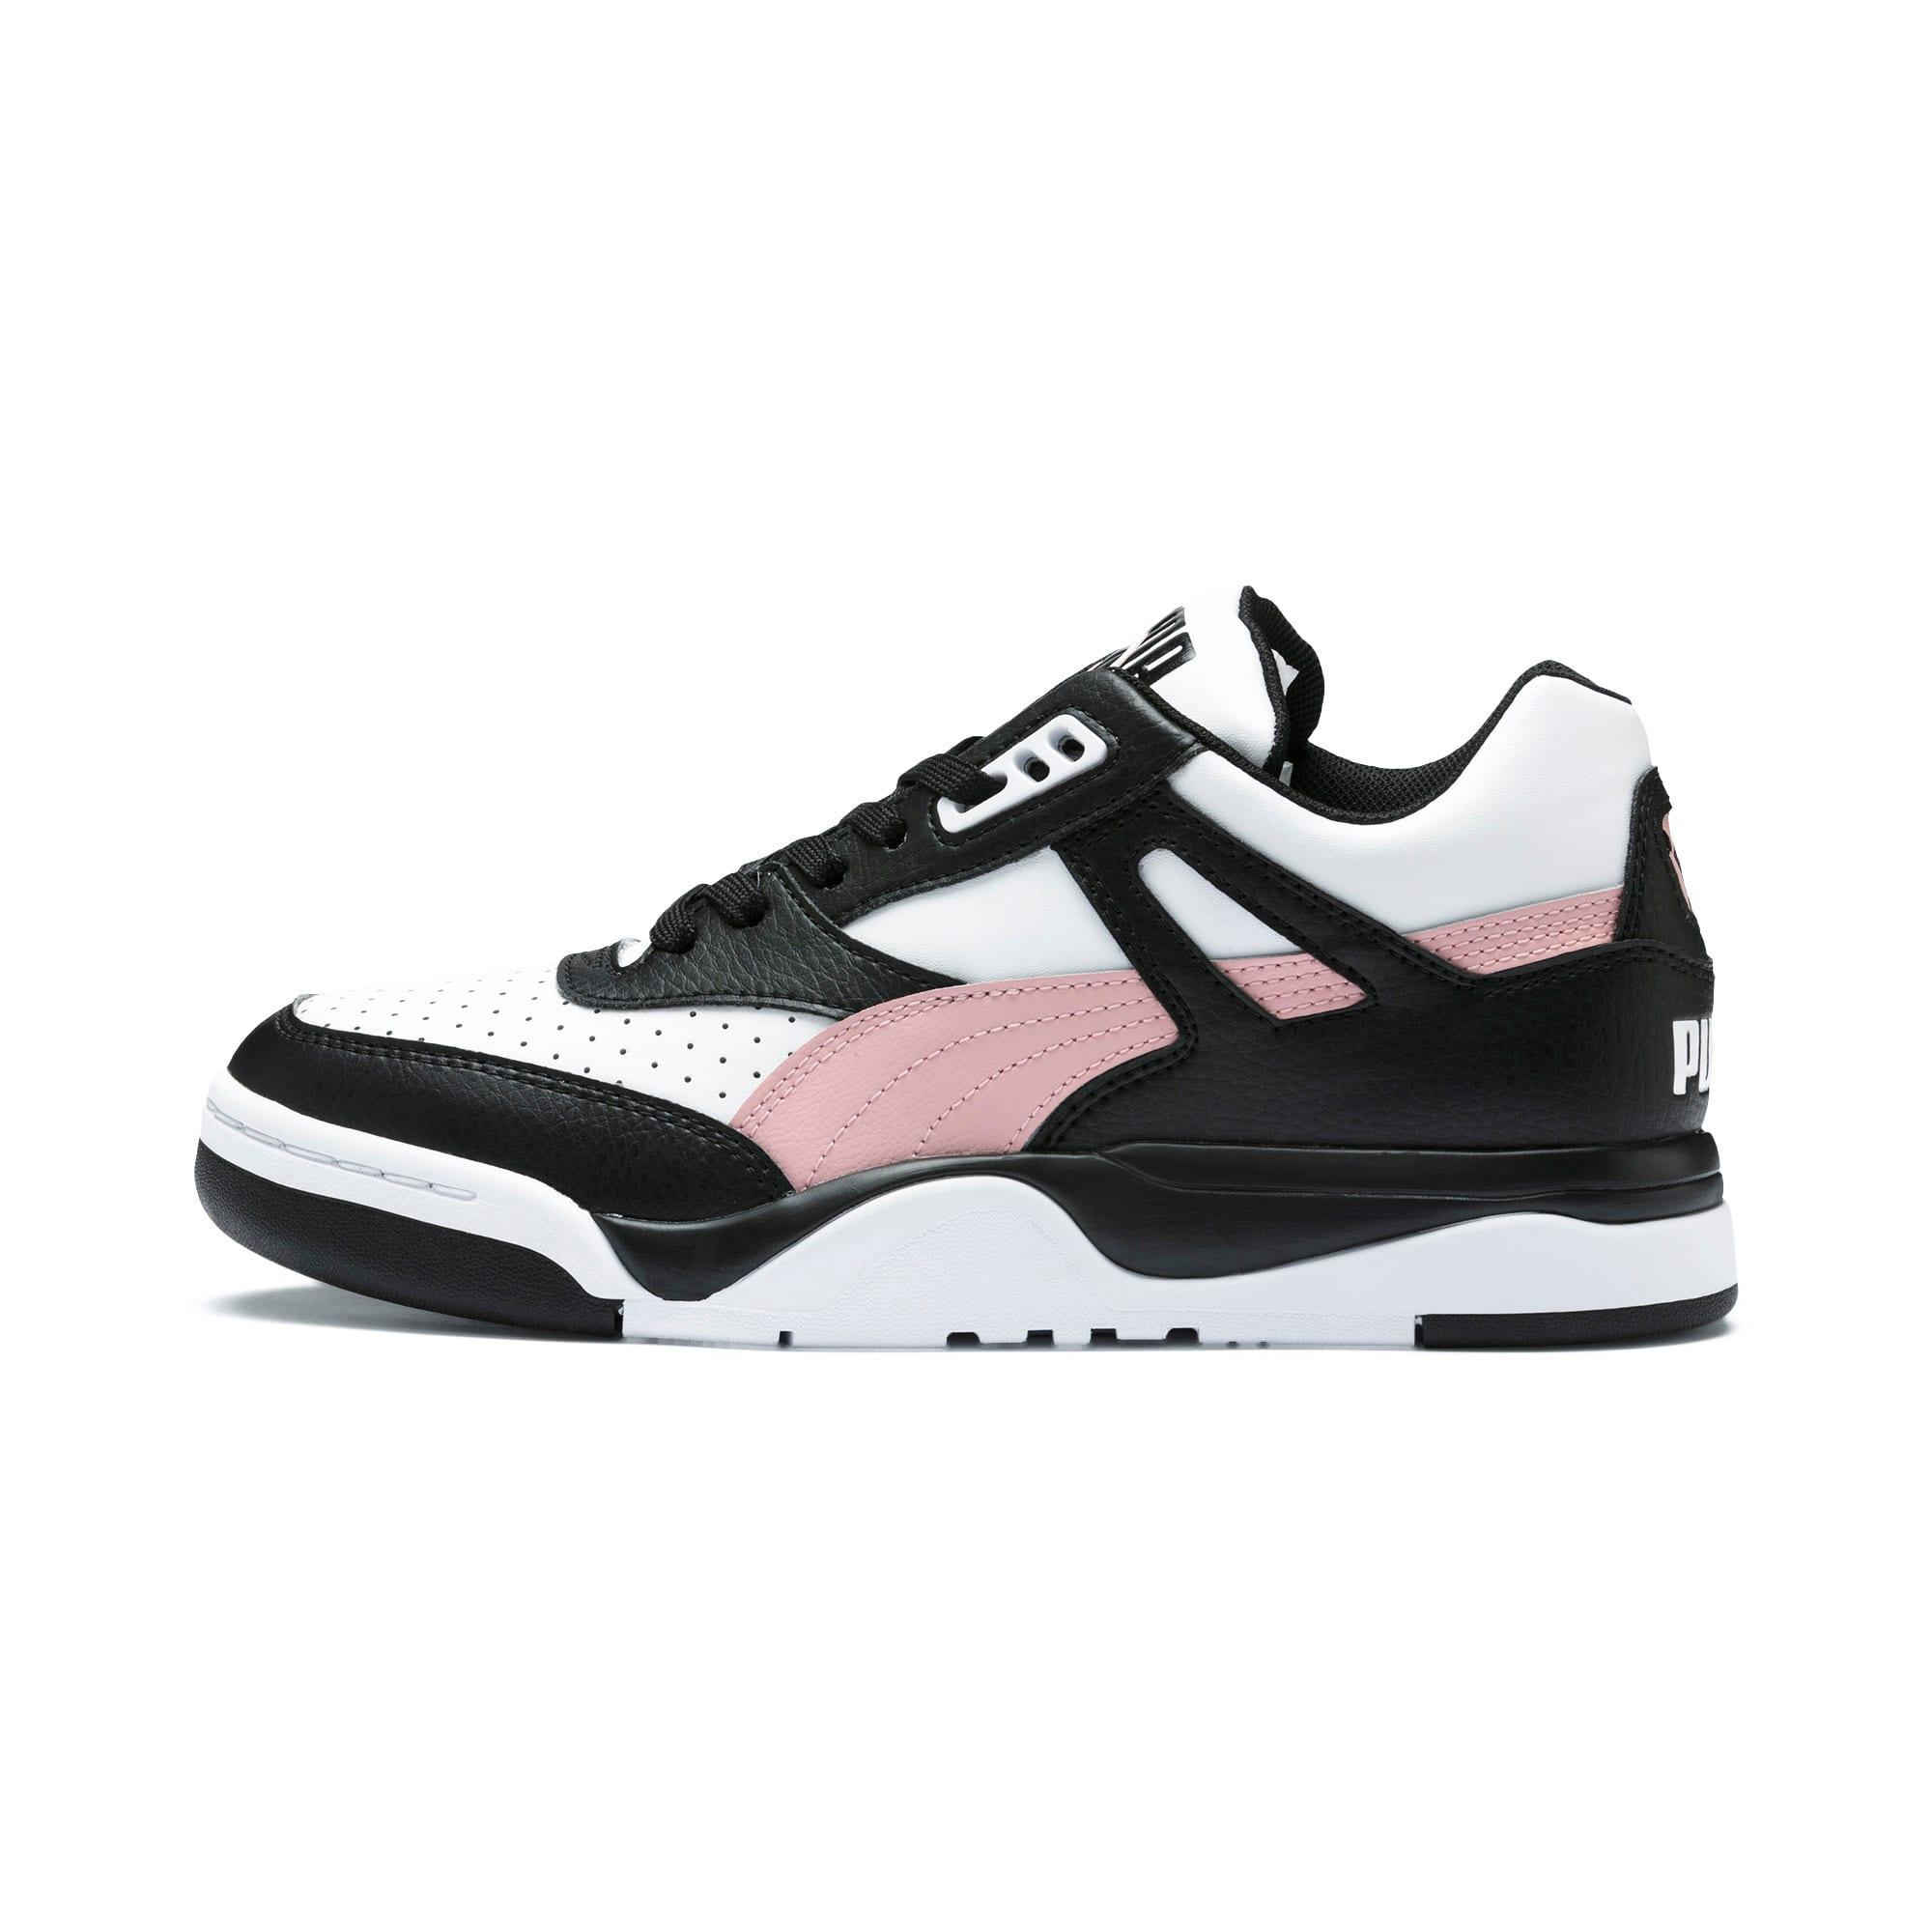 Thumbnail 1 of Palace Guard Colorblock Women's Sneakers, Puma Black-Puma White, medium